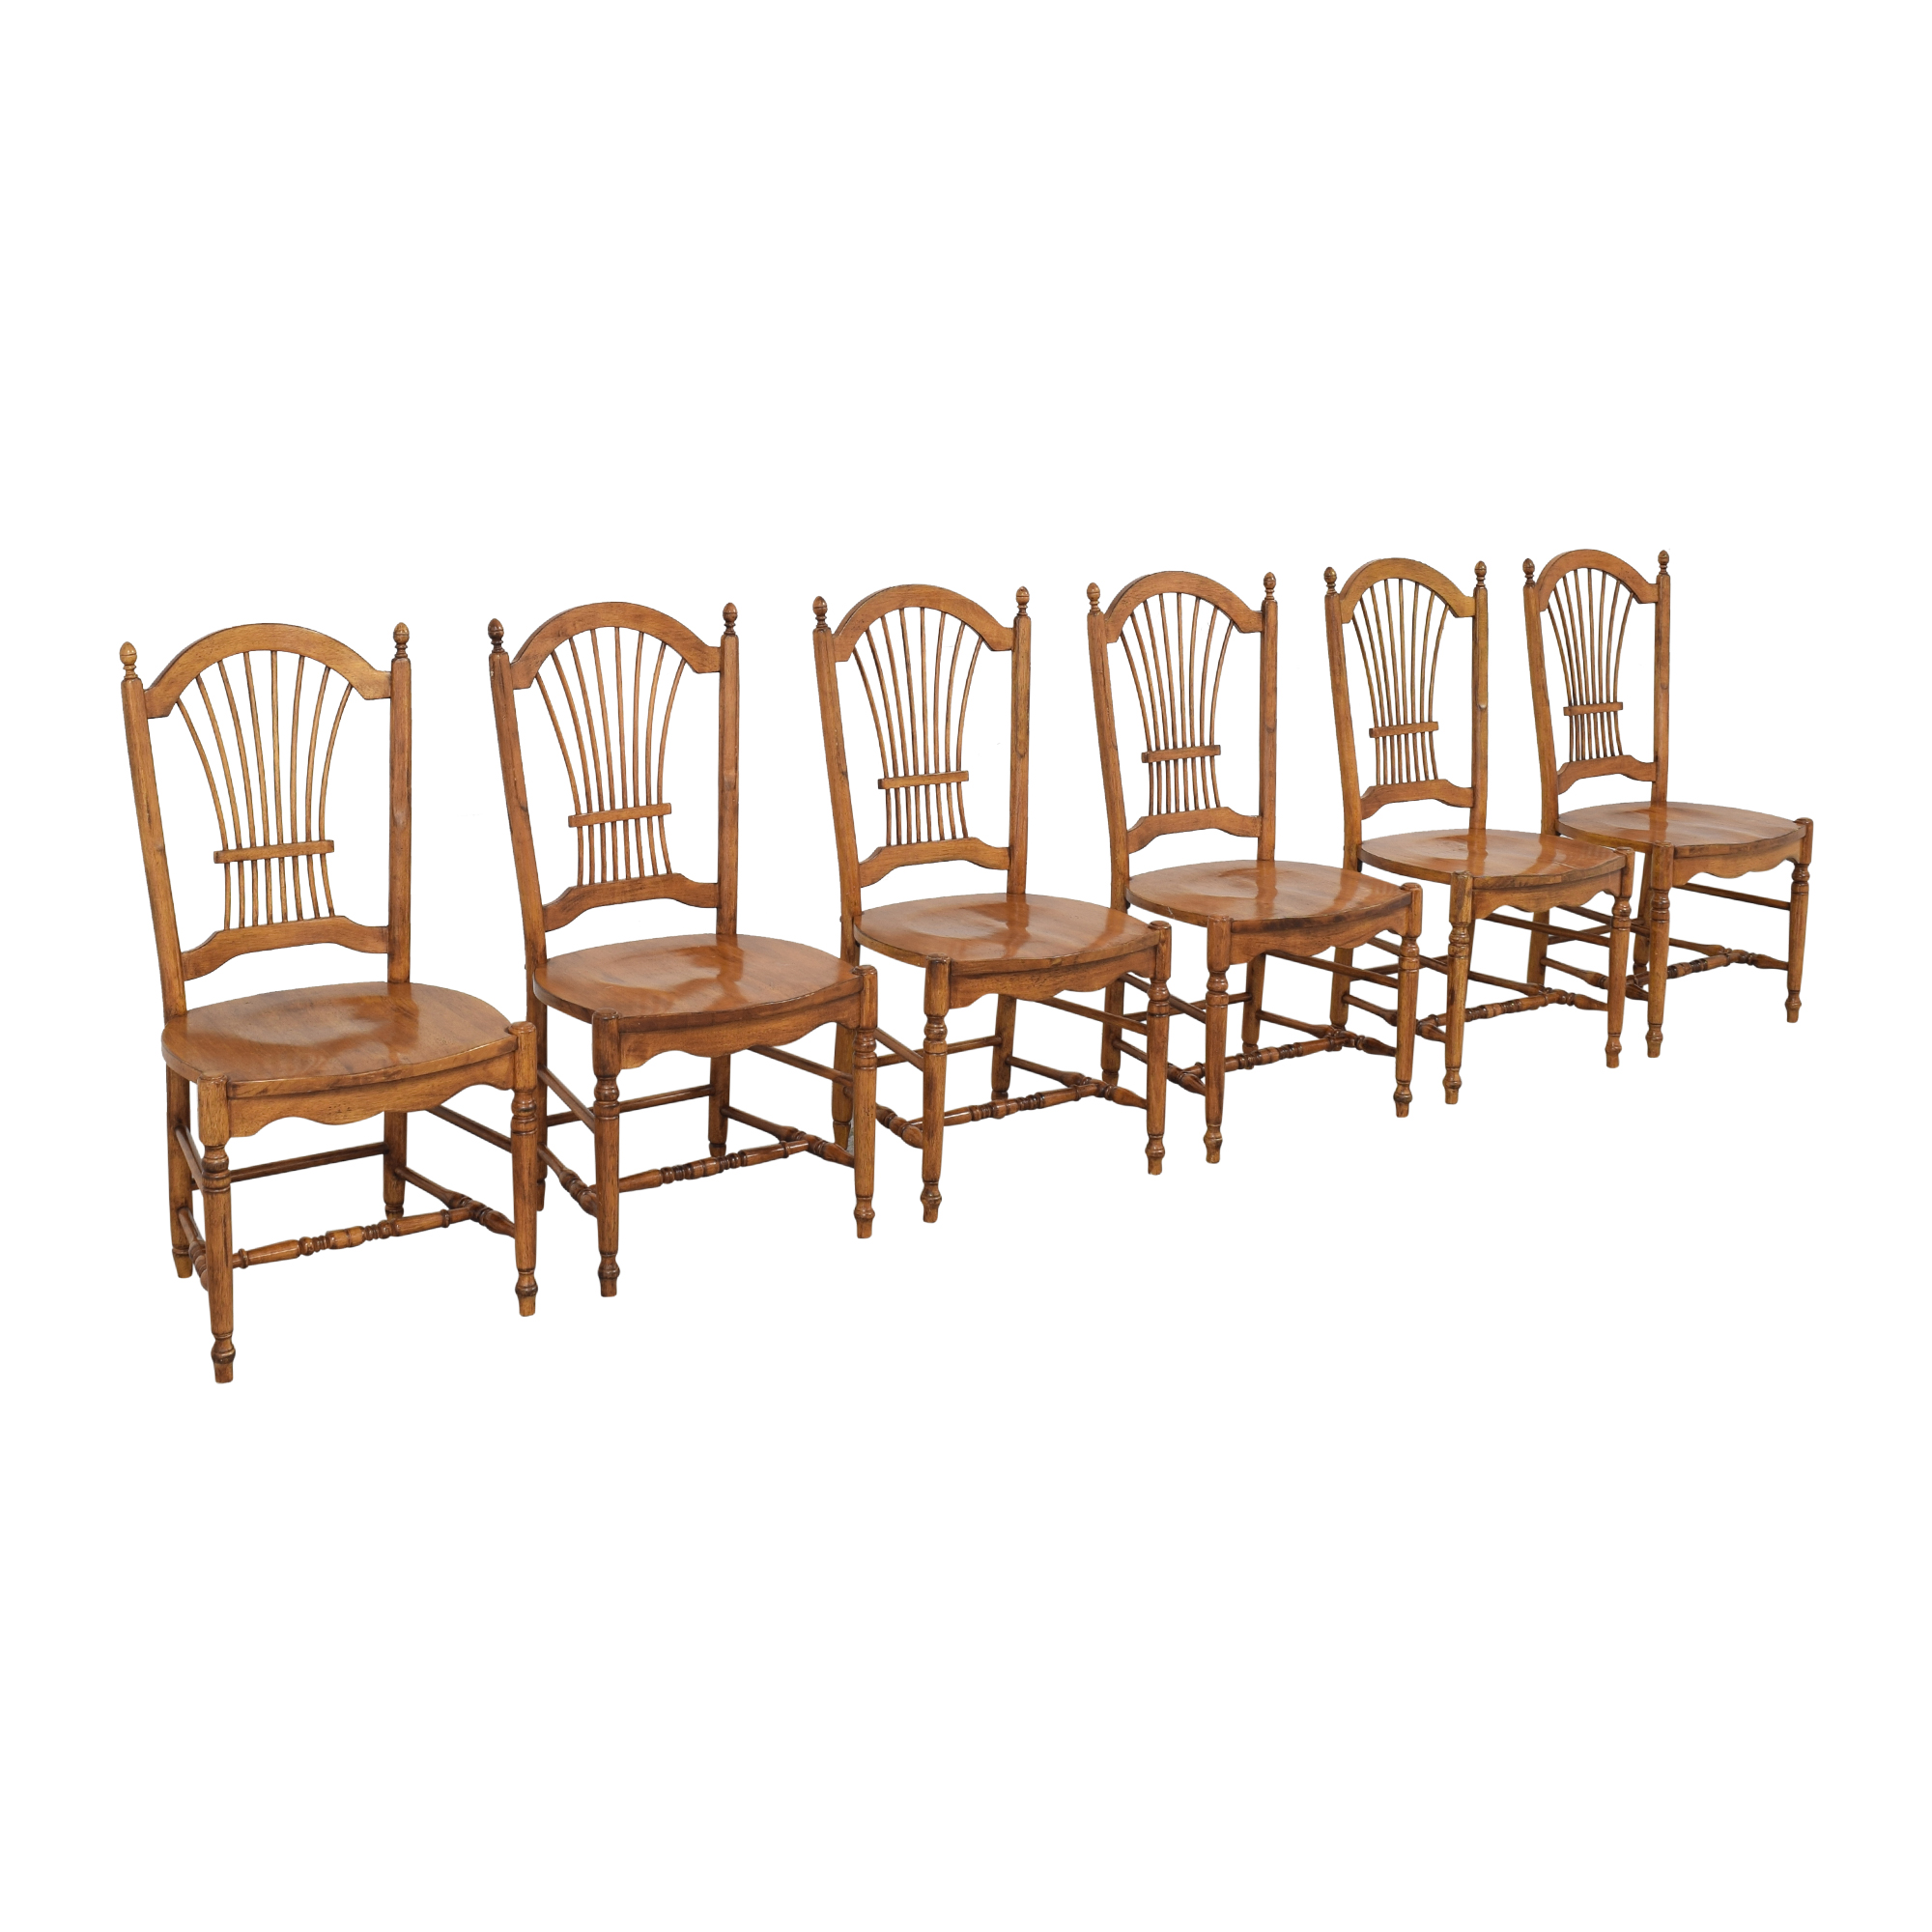 Drexel Drexel Sheaf Back Dining Chairs nj